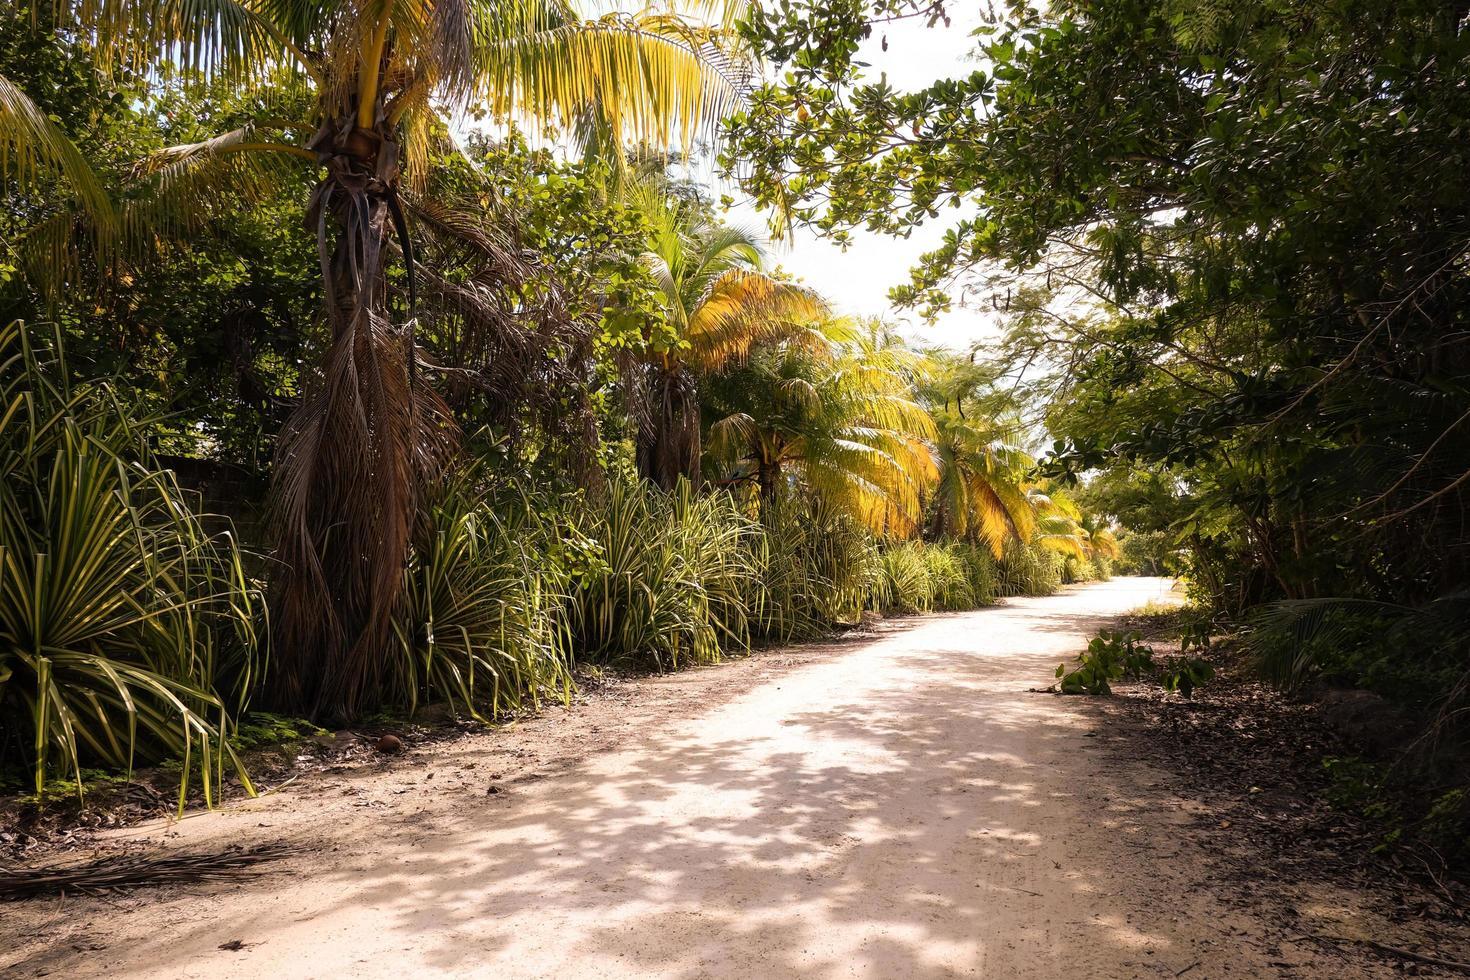 grusväg genom palmträd foto